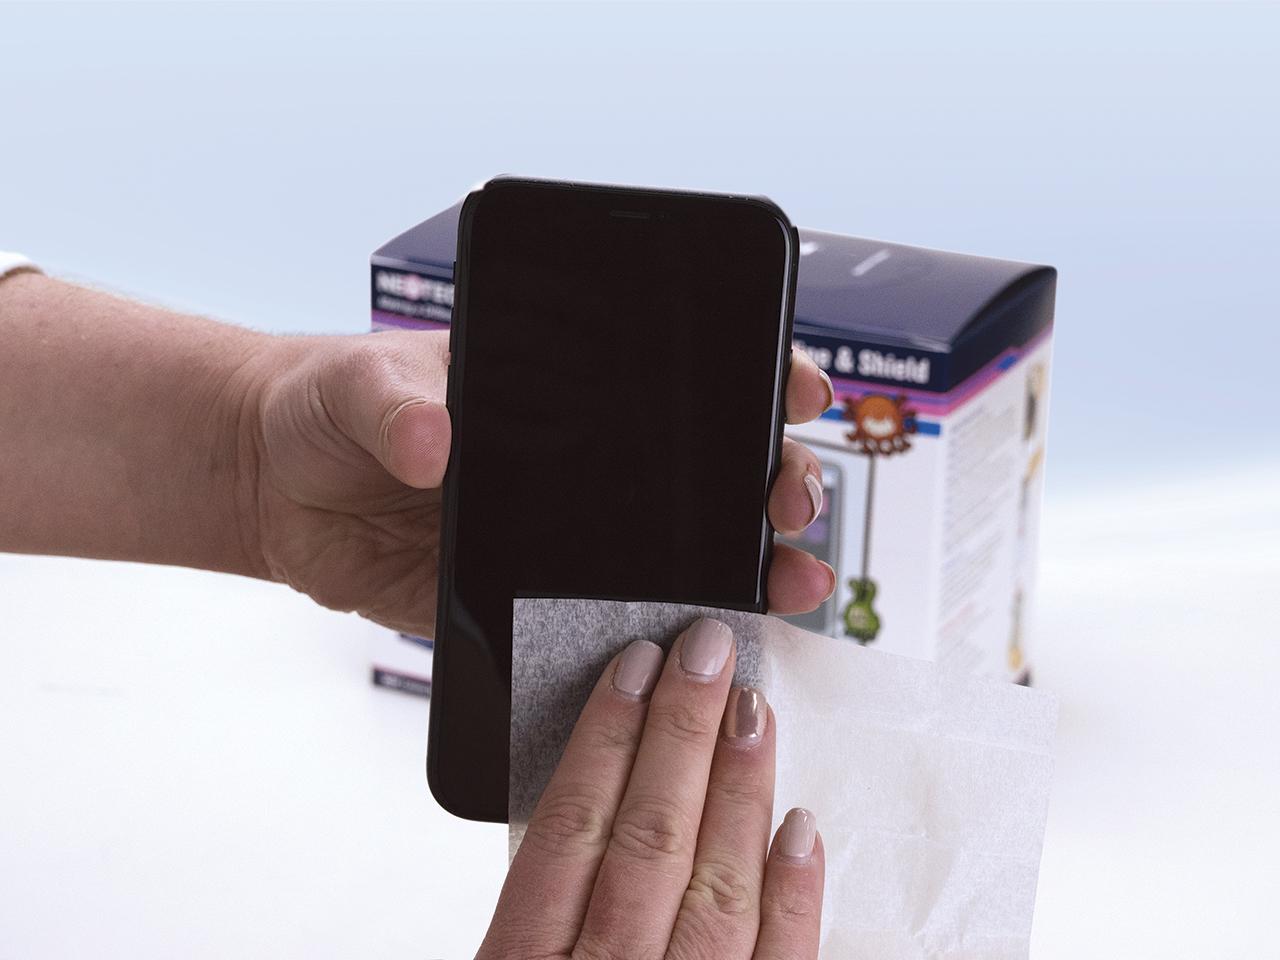 Wipe phone